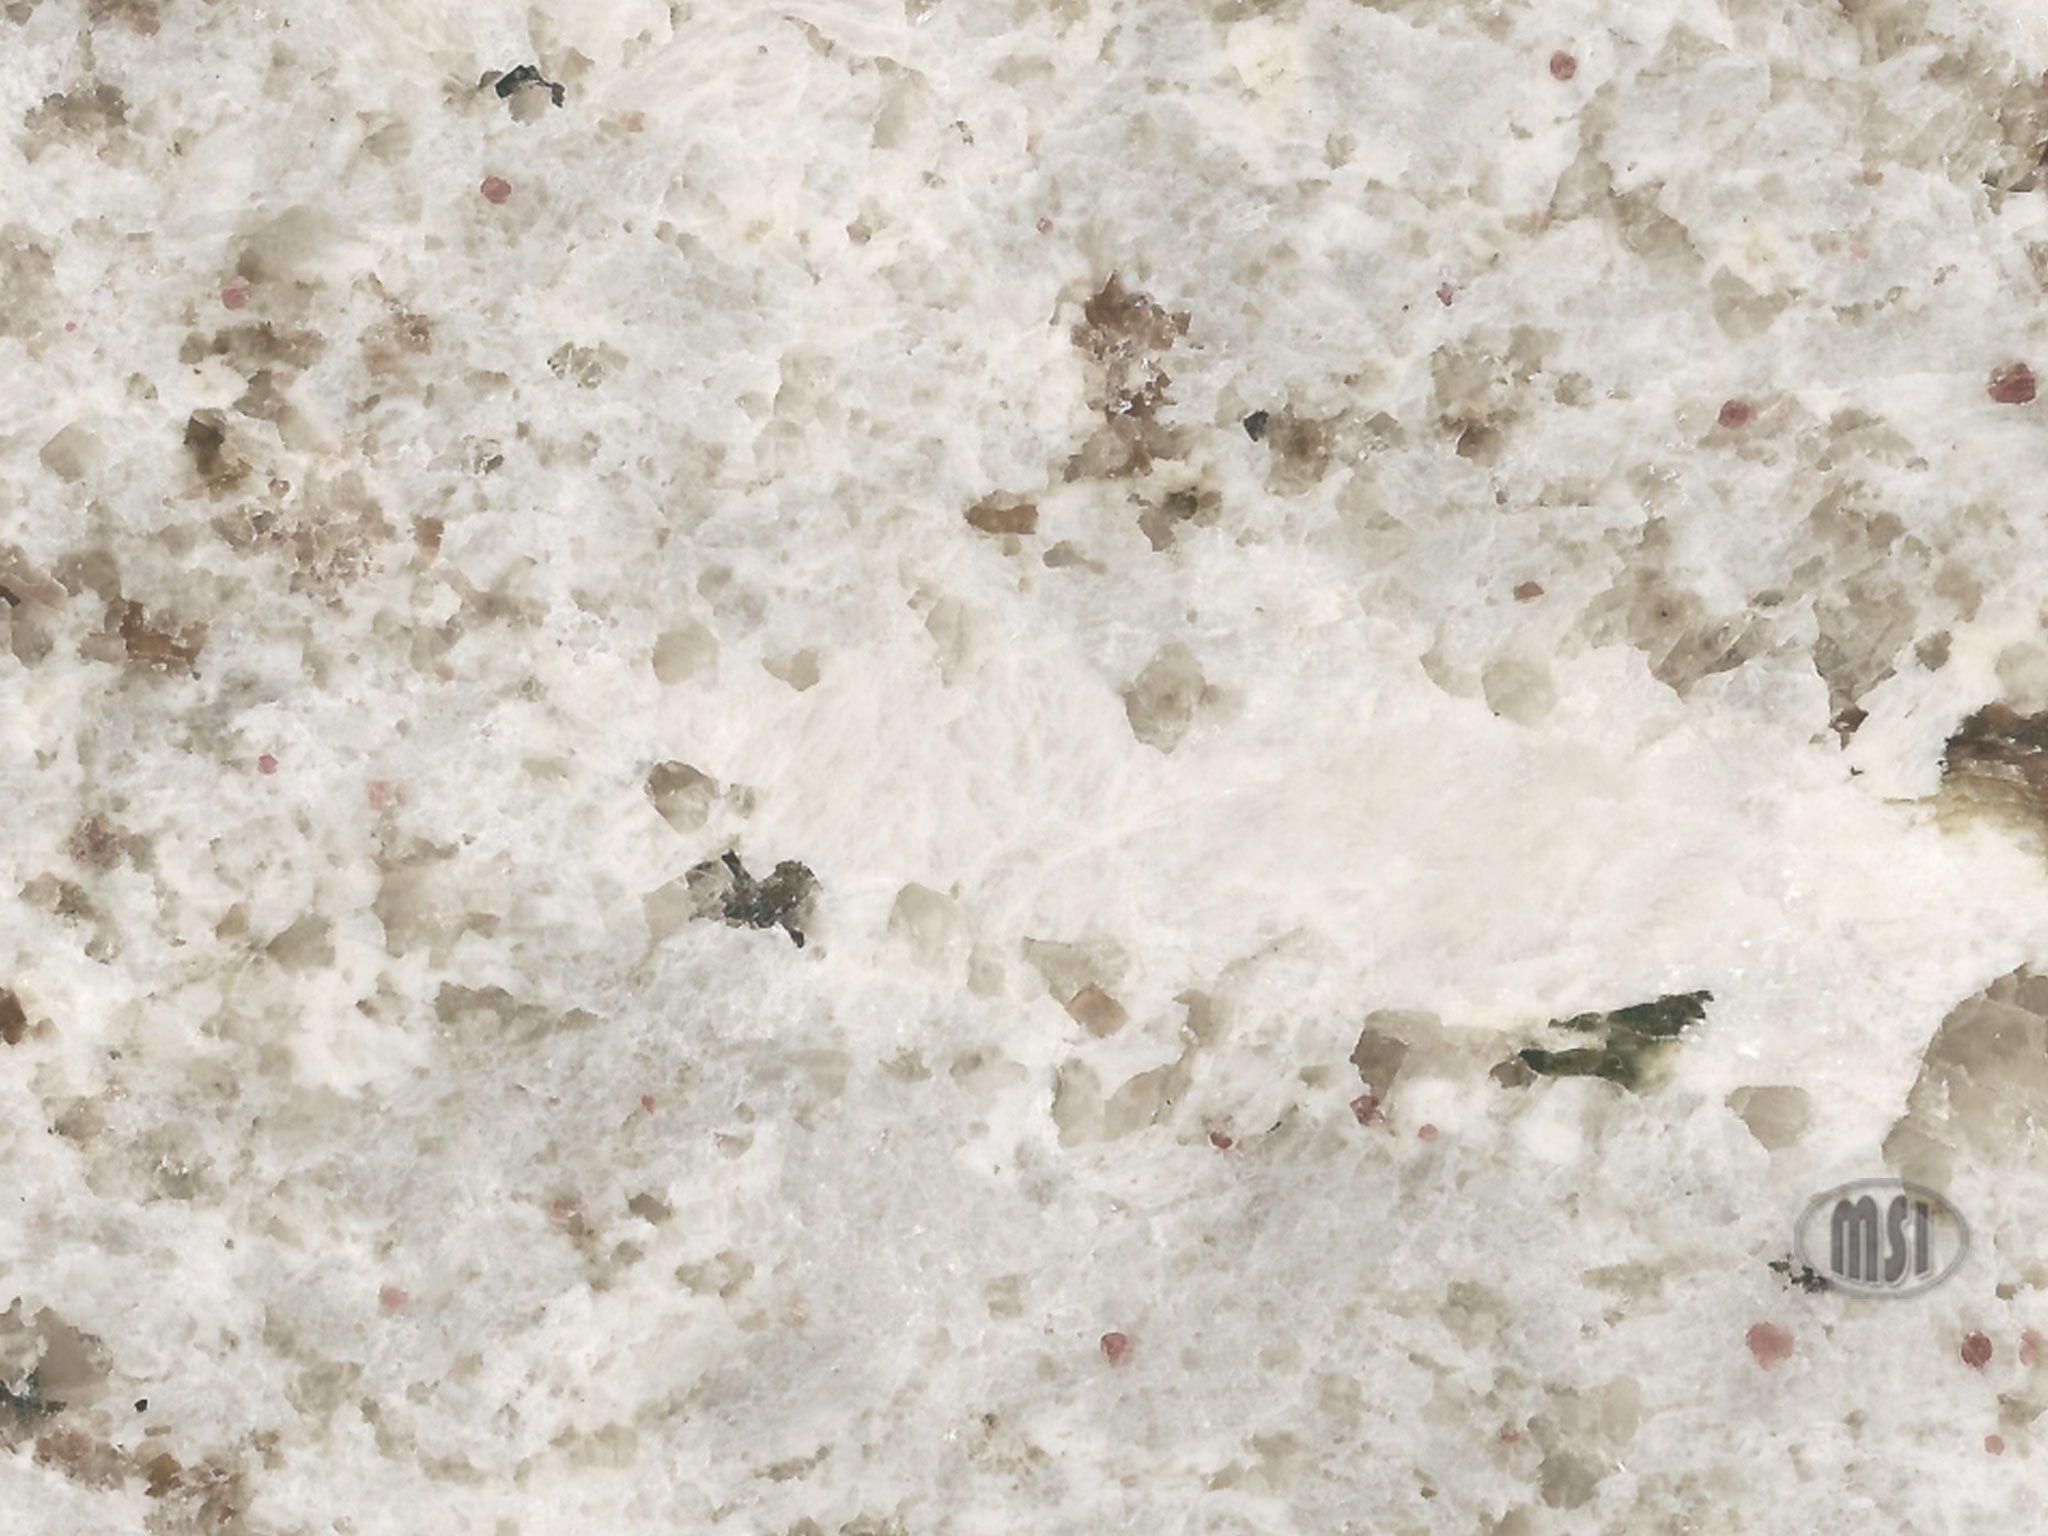 alaska-white granite prefab from MS International Stone | Enid St ...